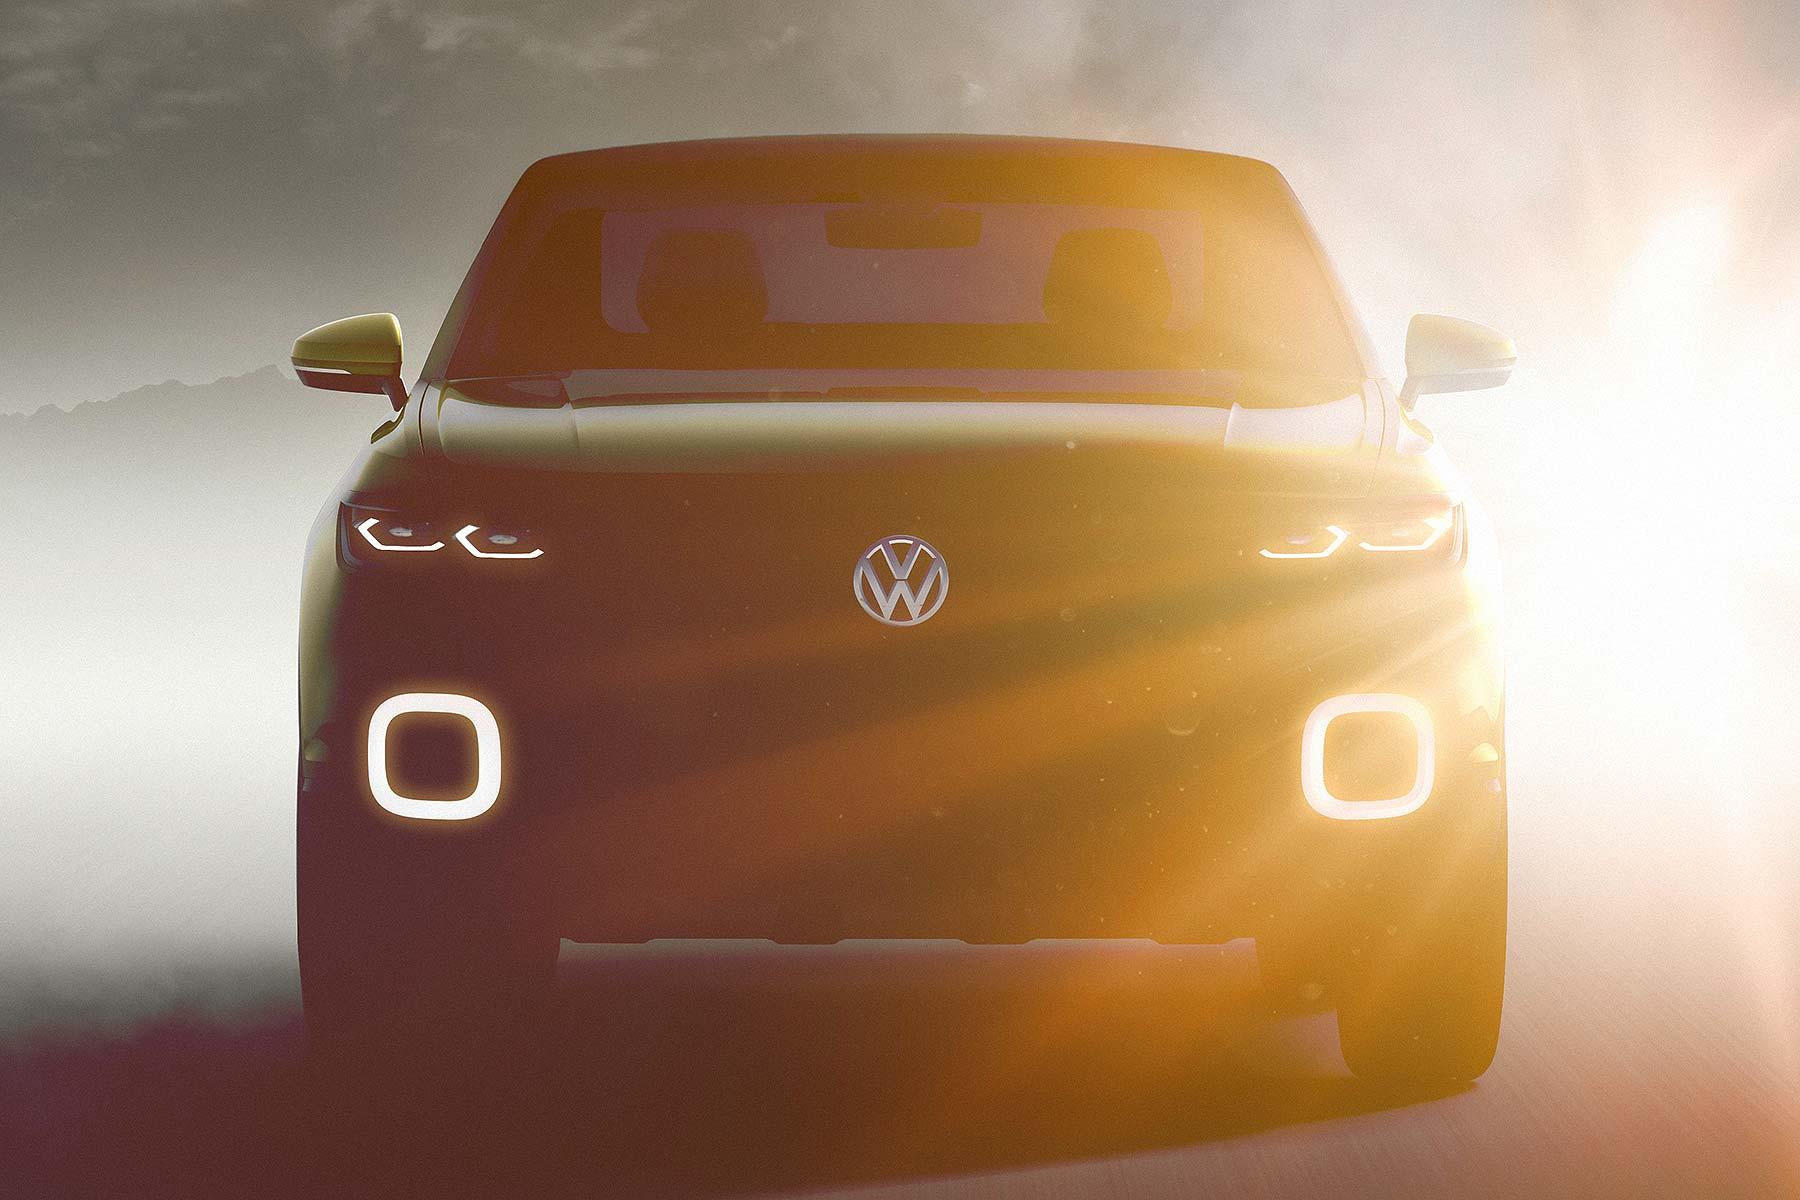 Volkswagen T-Cross Geneva 2016 SUV concept